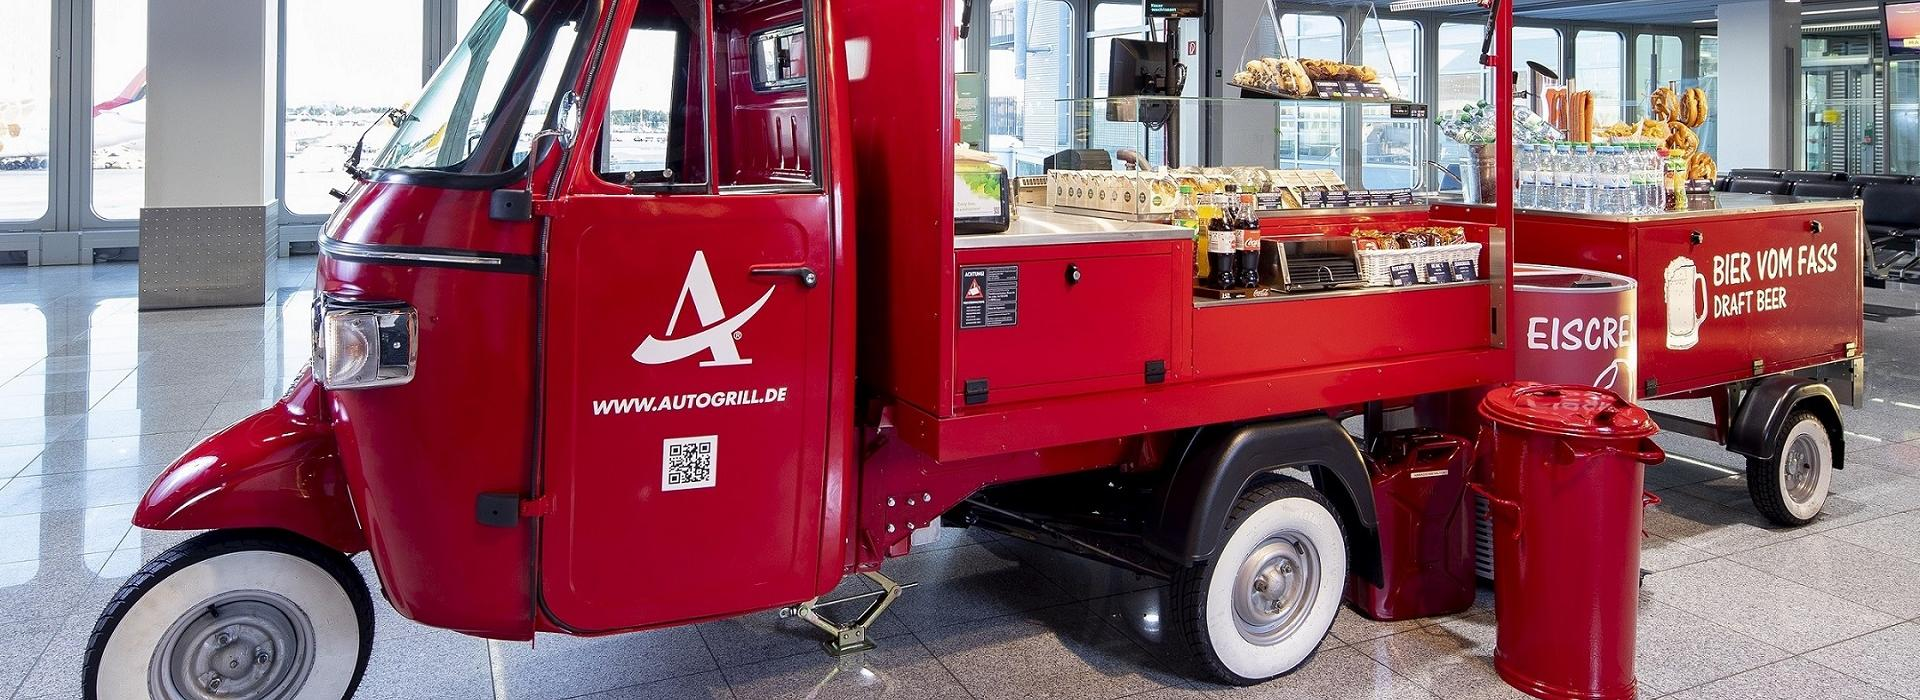 Autogrill Deutschland   Feeling good on the move ®